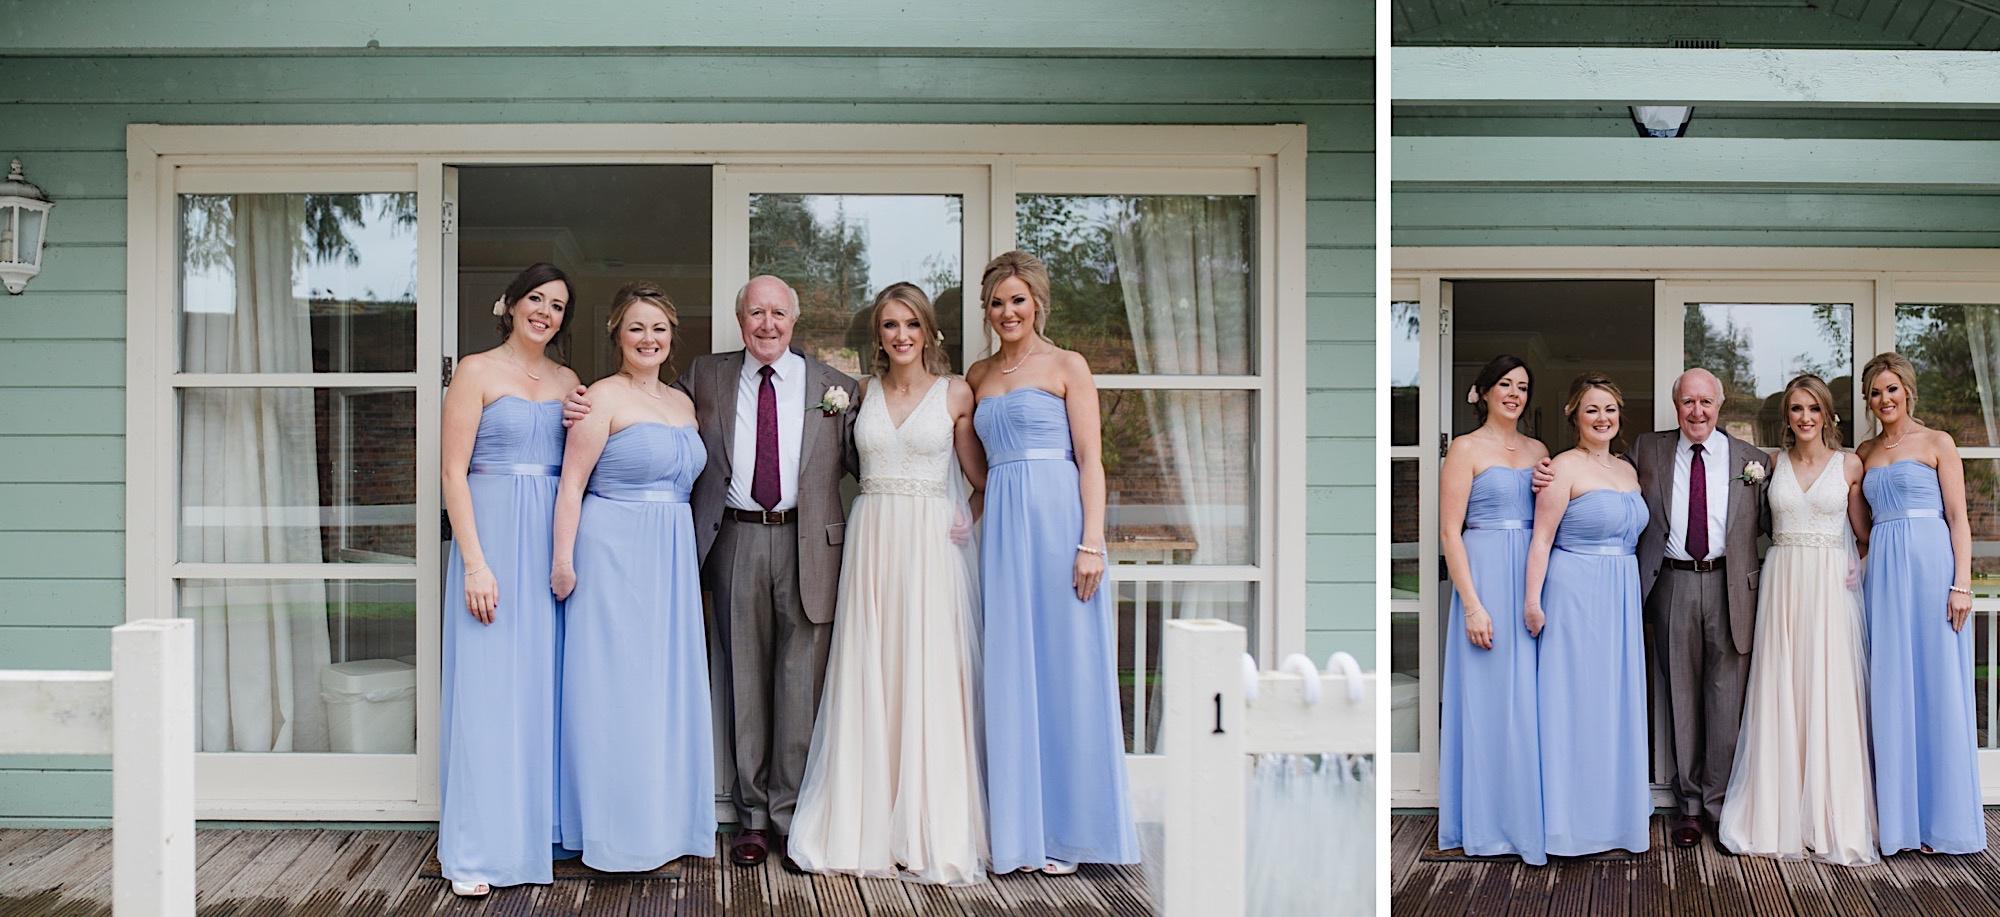 lilac bridesmaid dresses autumn wedding loch lomand